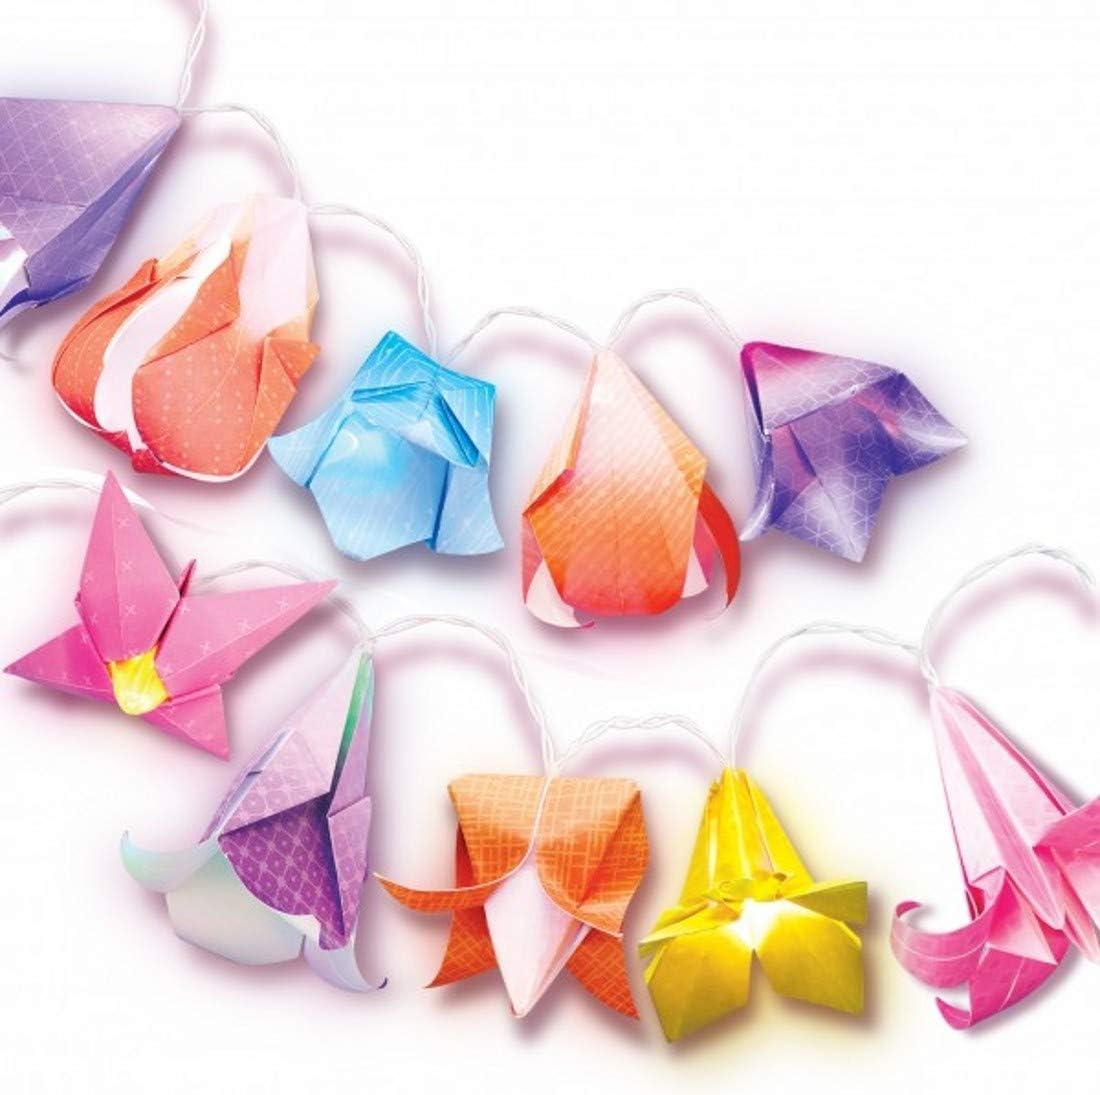 4M KidzMaker Flower Lights Origami